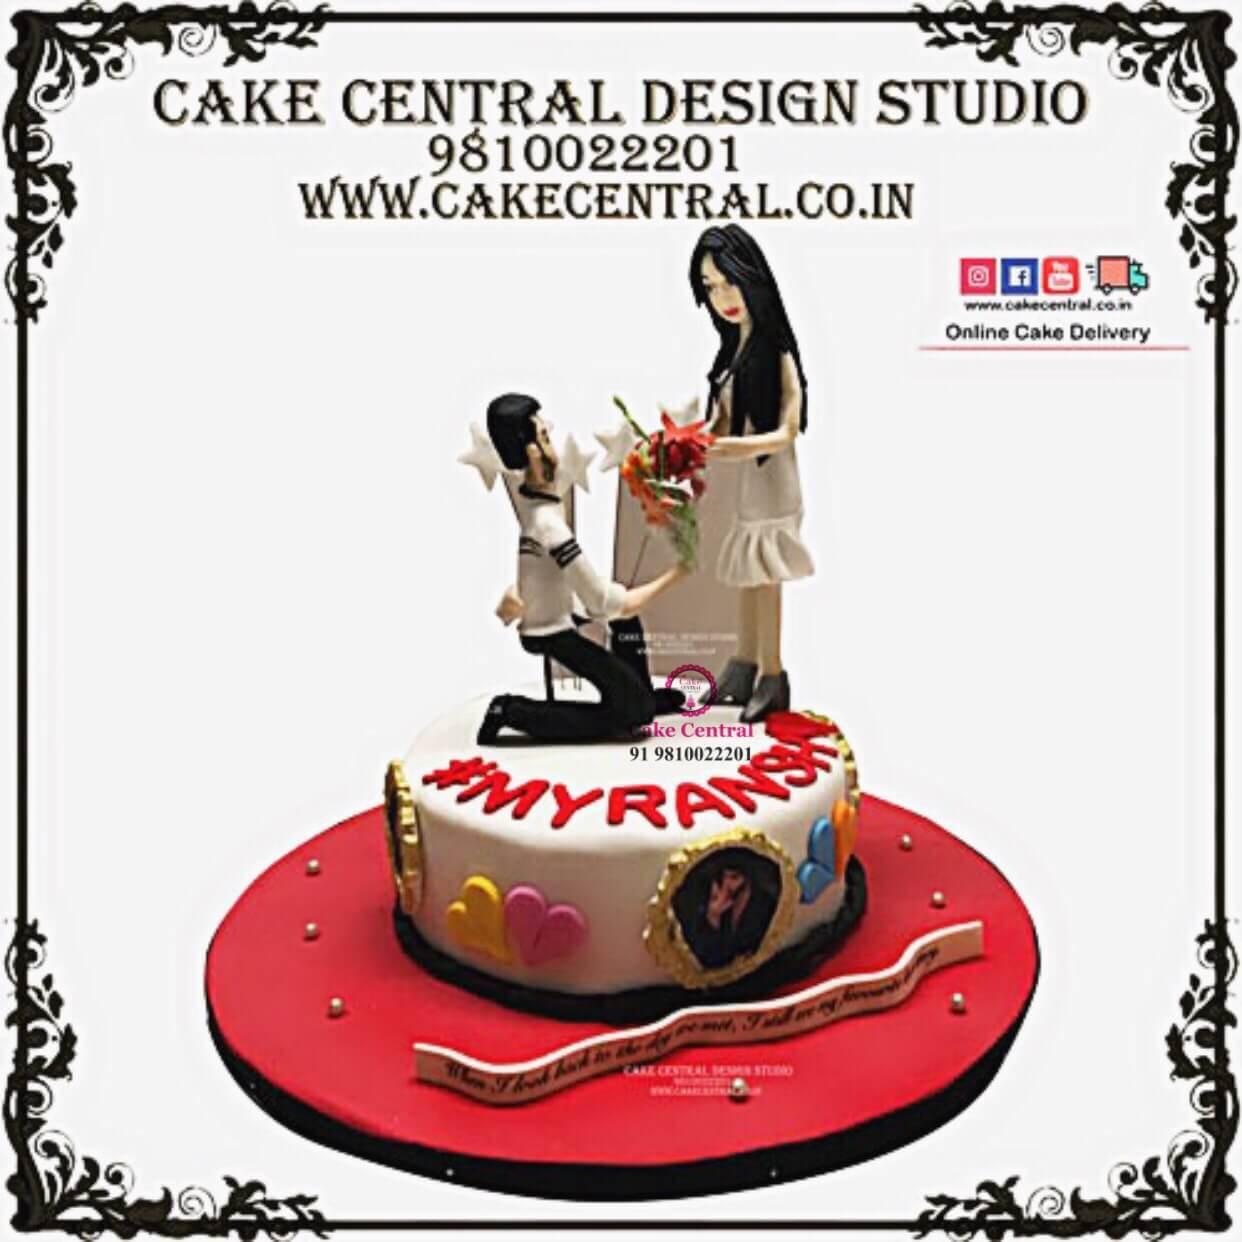 Heart Shaped Romantic Cakes In Delhi Amazing Customised Cake Designs